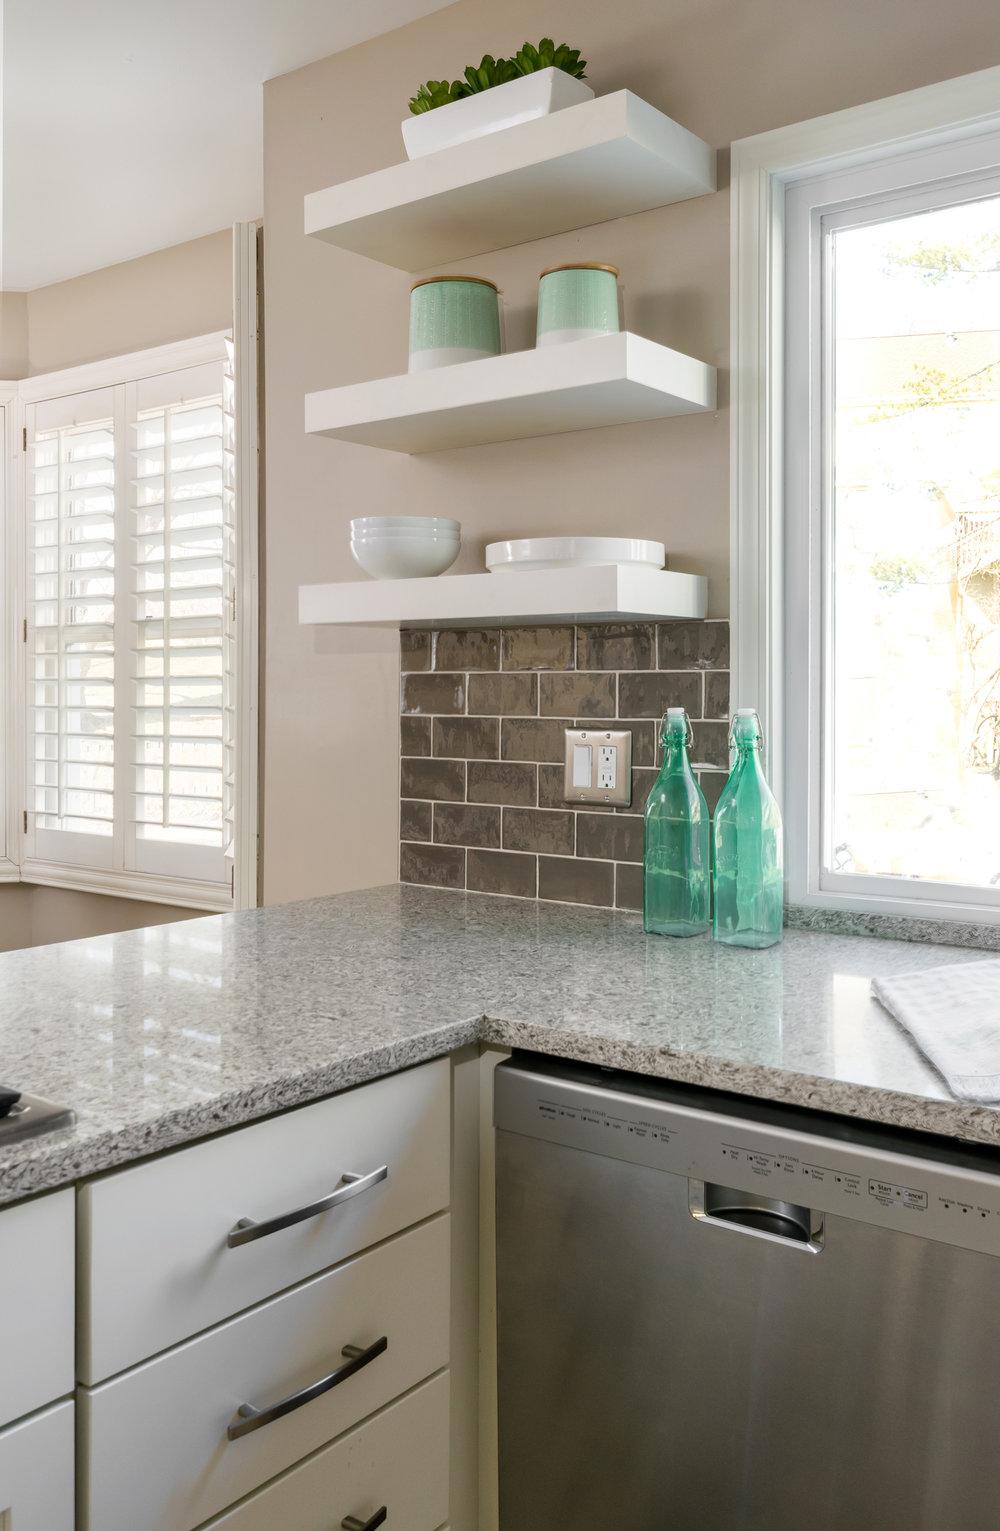 Kitchen Countertops and Modern Shelves